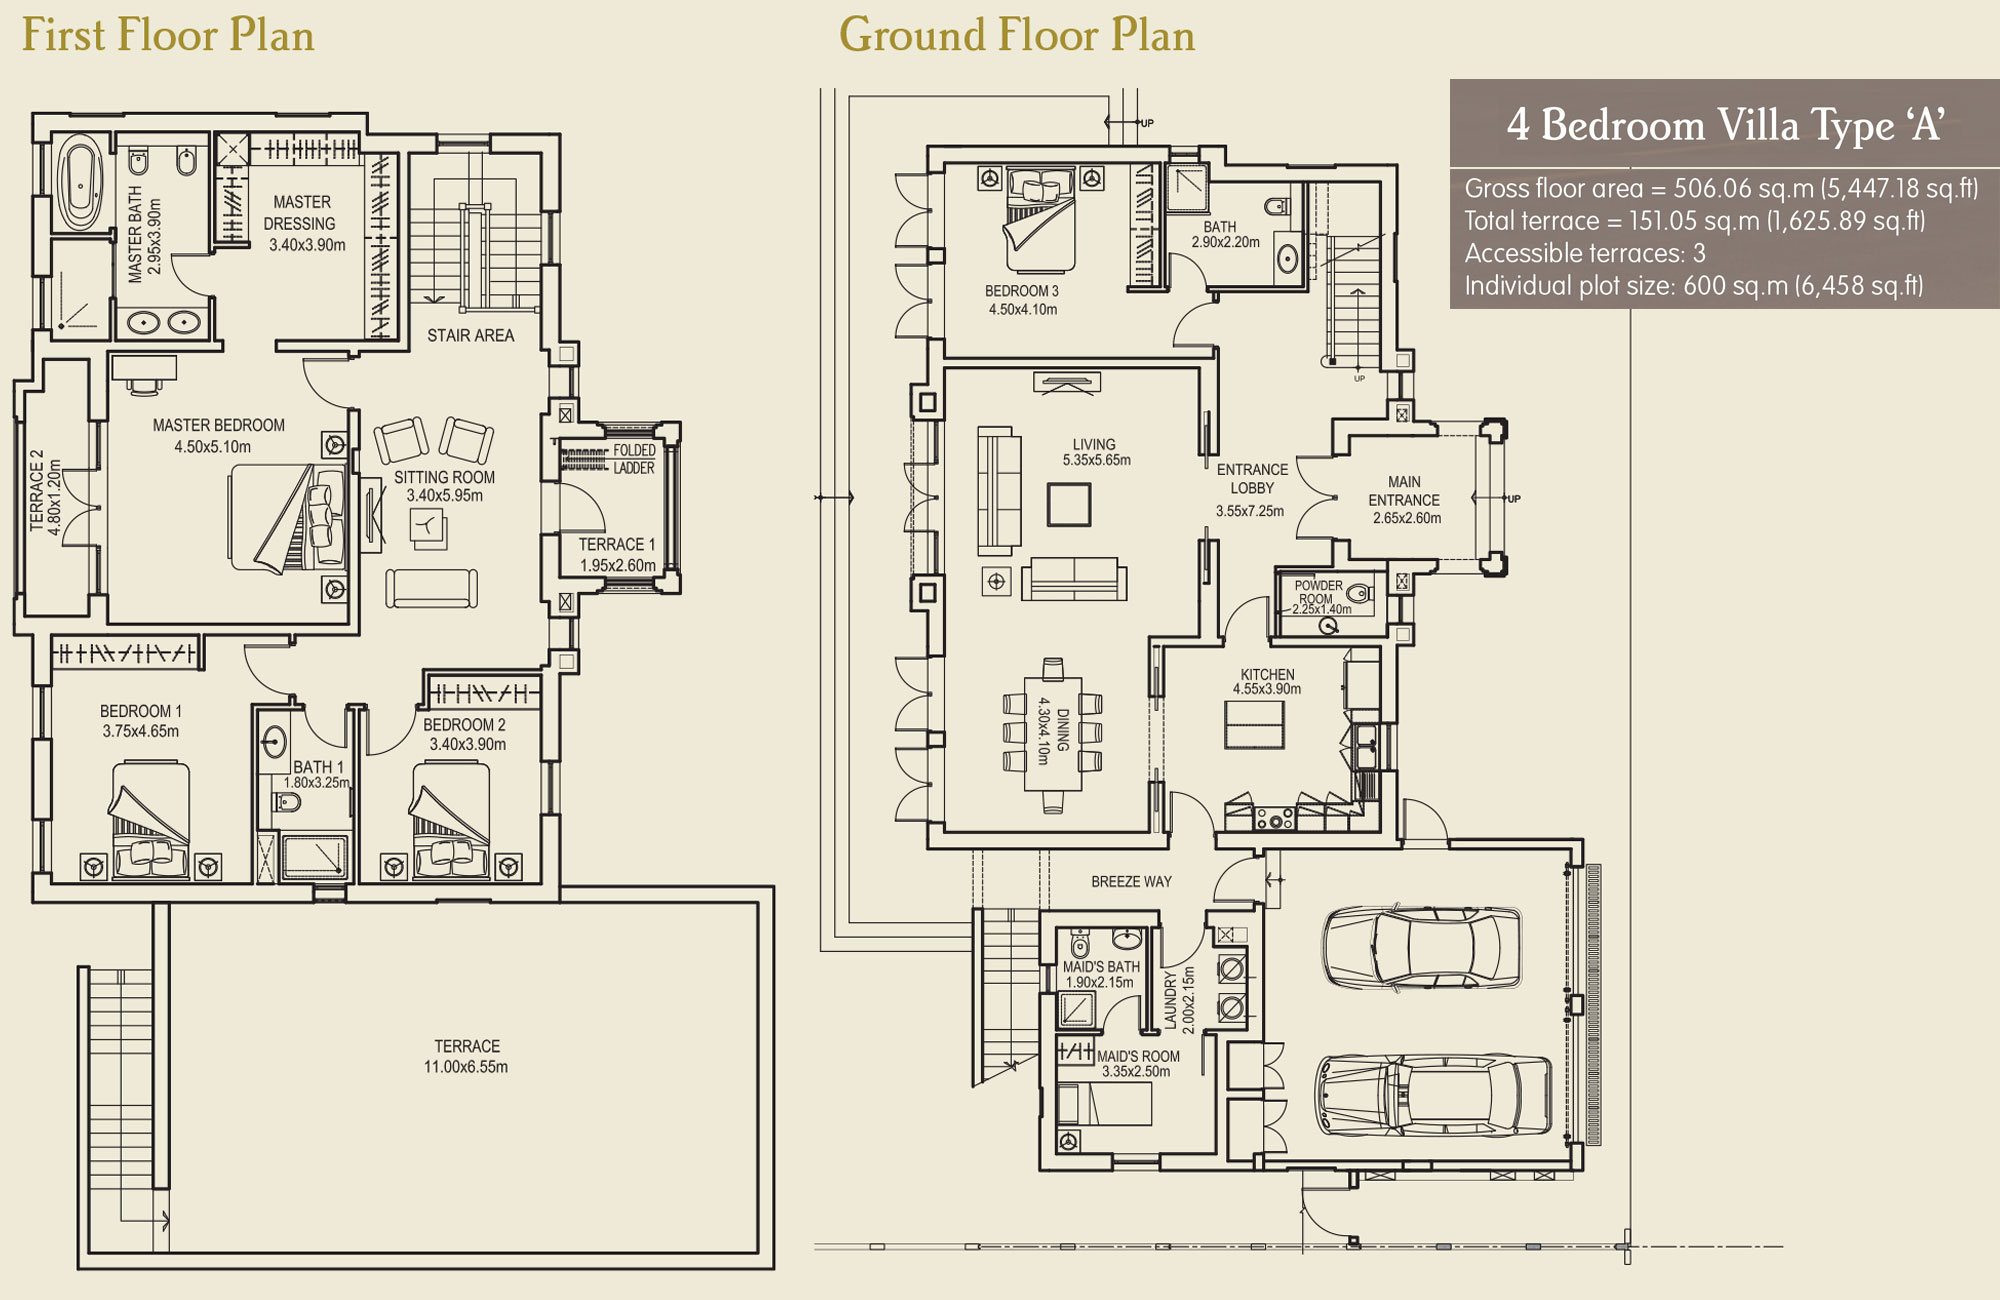 4 Bedroom Villa Type A, Size 5447.18 sq.ft.